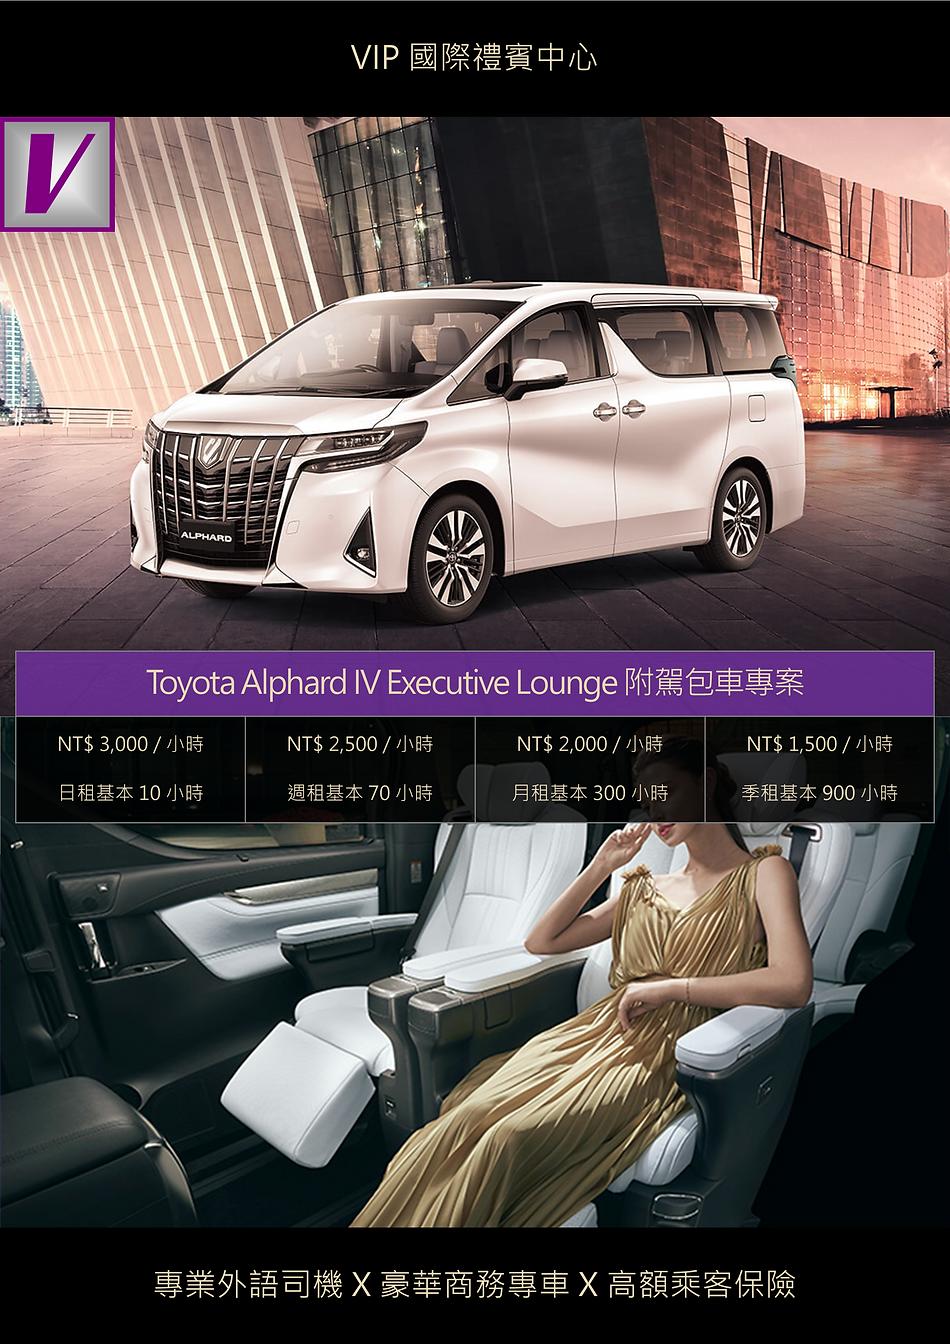 VIP國際禮賓中心 TOYOTA ALPHARD IV EXECUTIVE LOUNGE 附駕包車專案 DM.png